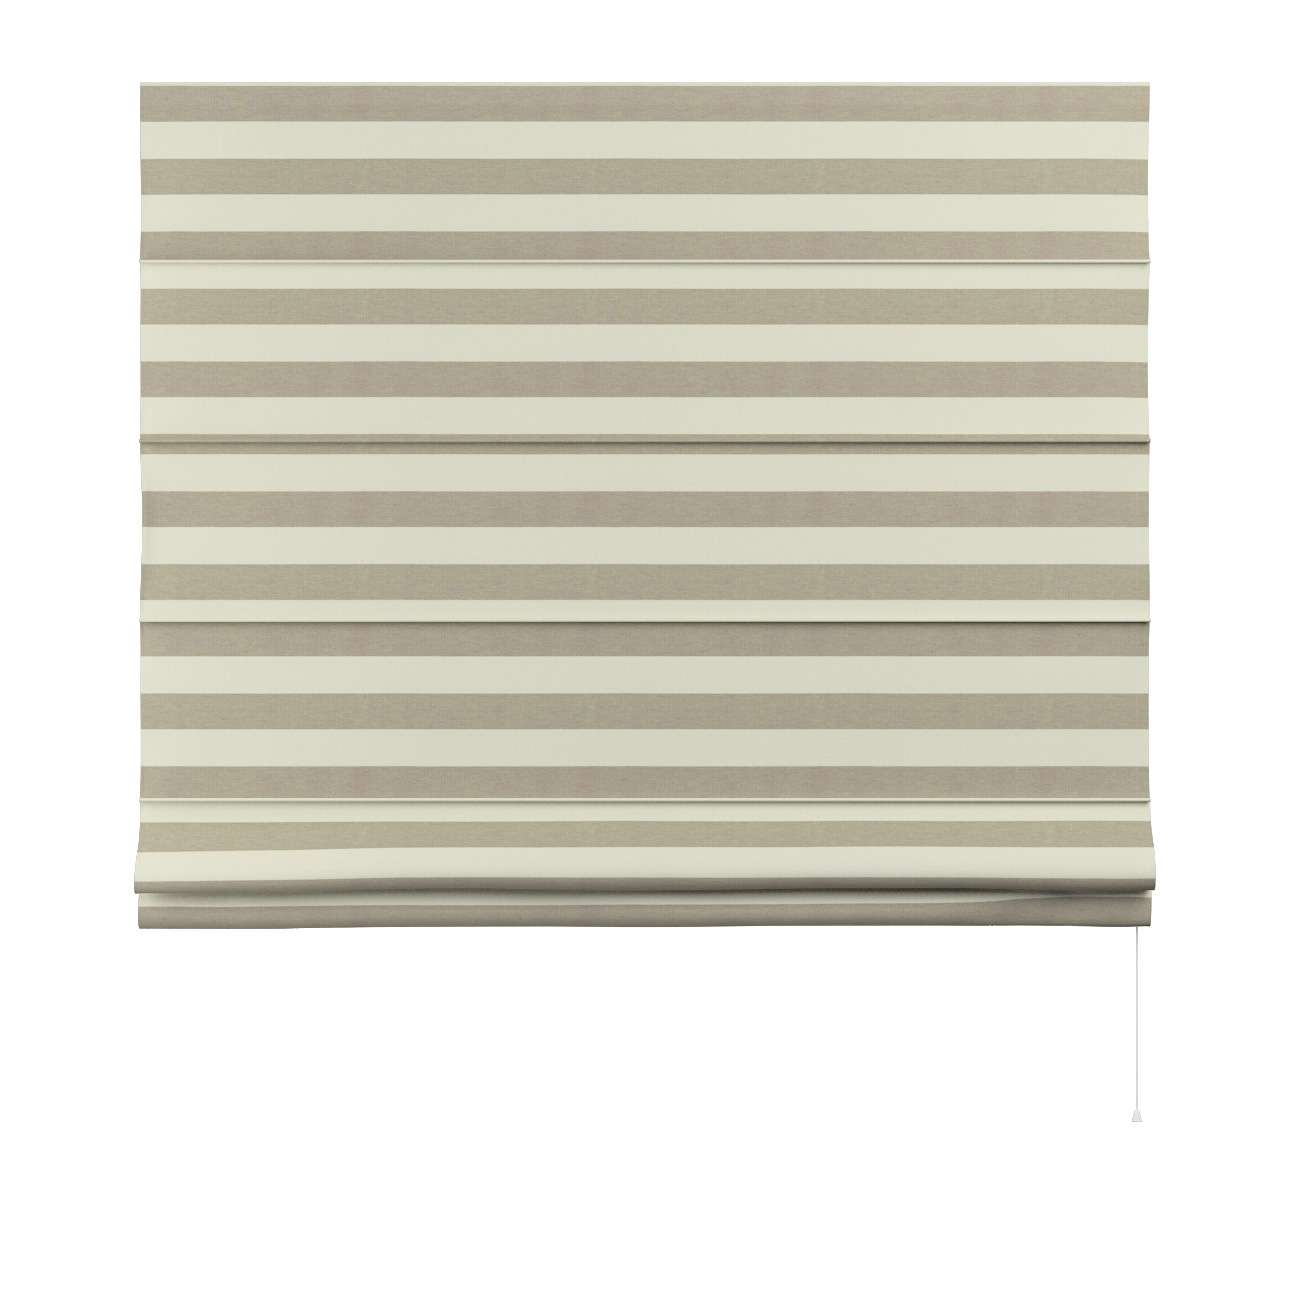 Capri roman blind in collection Quadro, fabric: 142-73